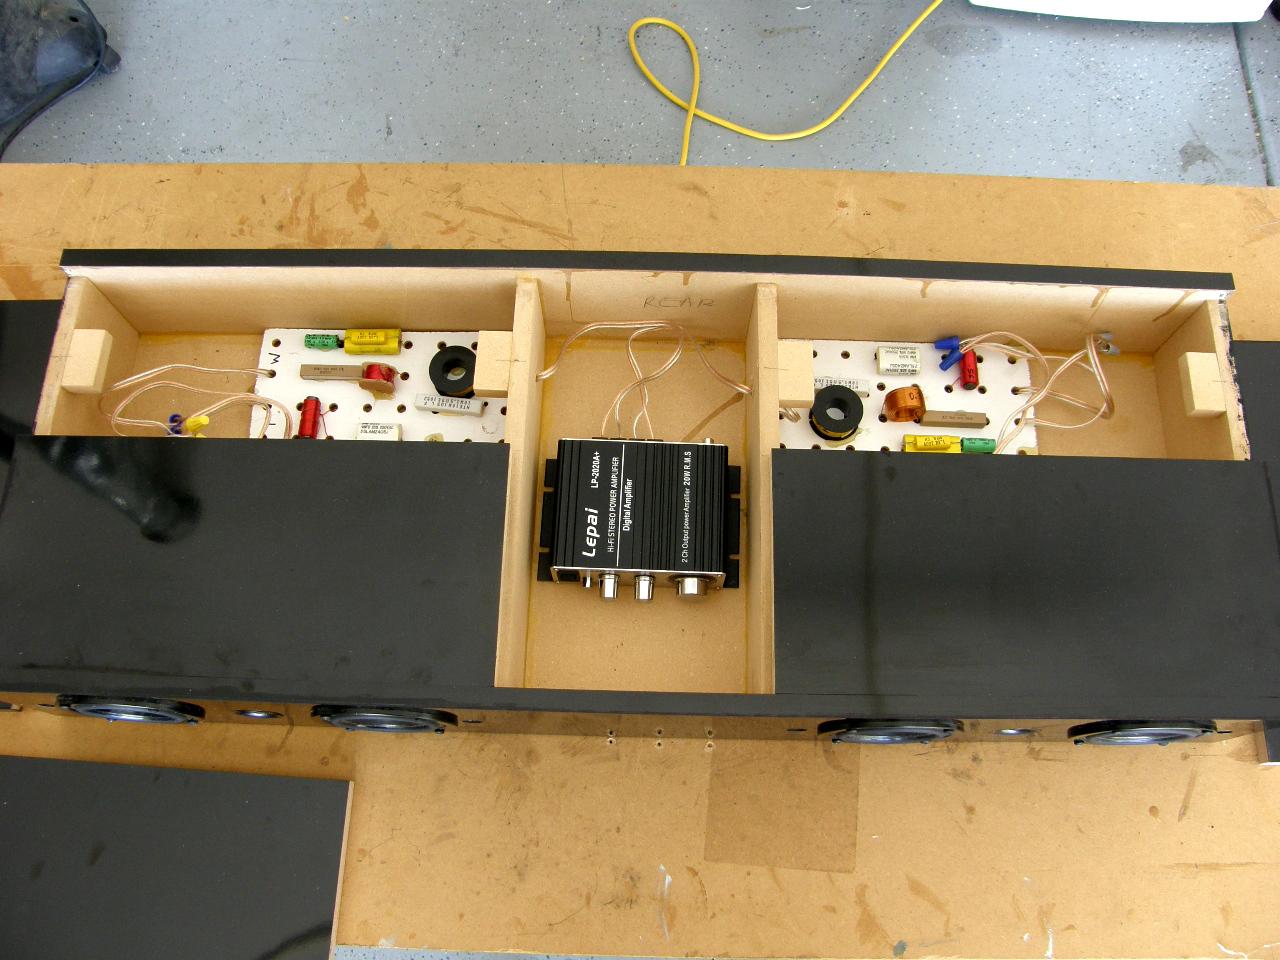 sonata soundbar project done techtalk speaker